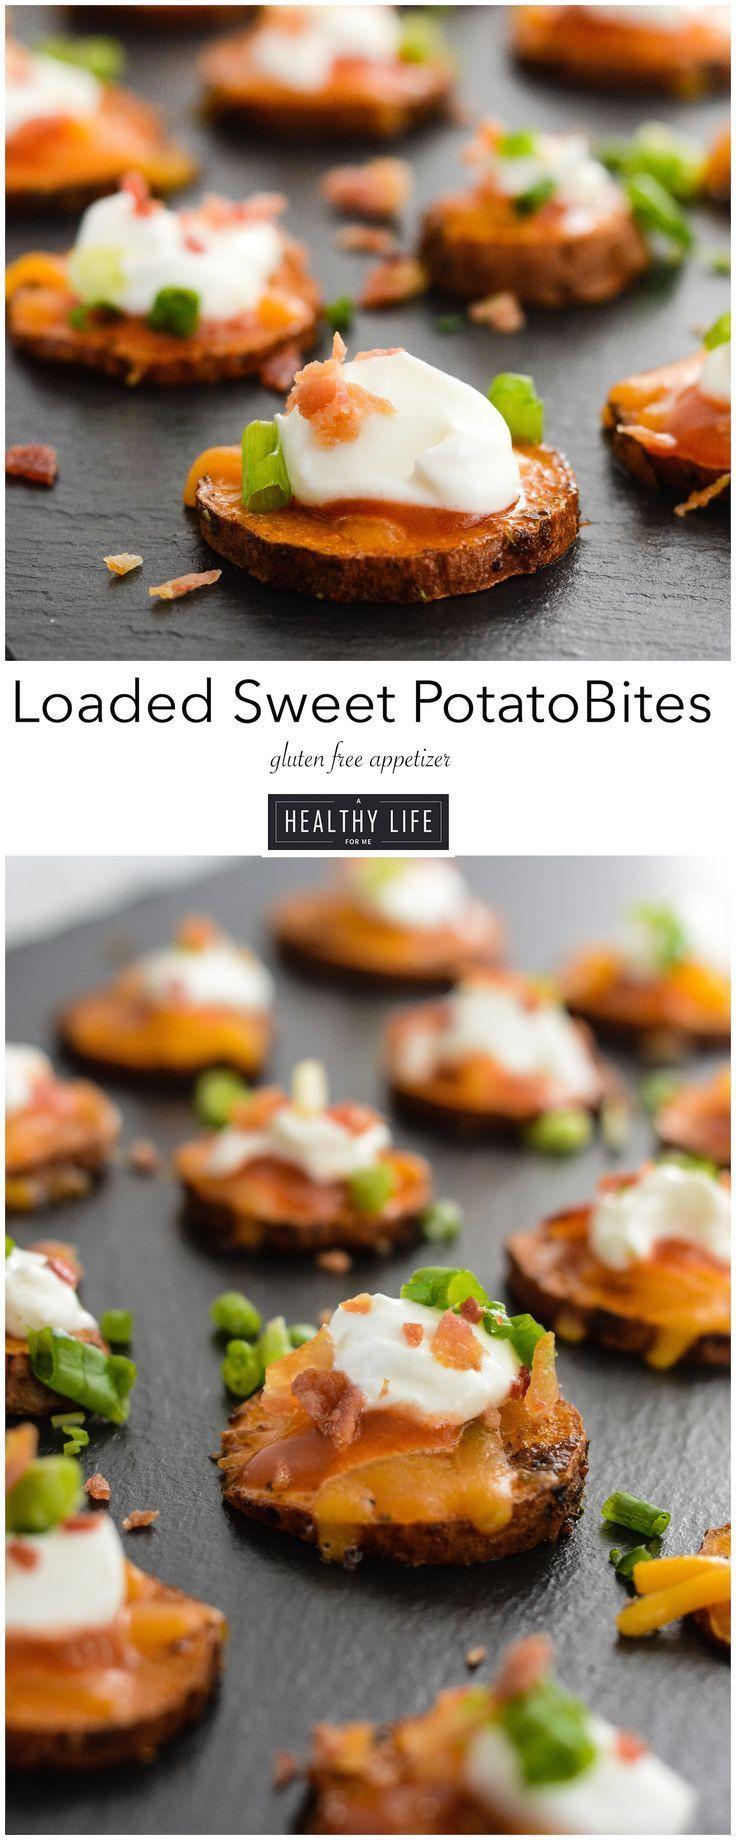 Best Appetizers For Thanksgiving  Loaded Sweet Potato Bites Recipe